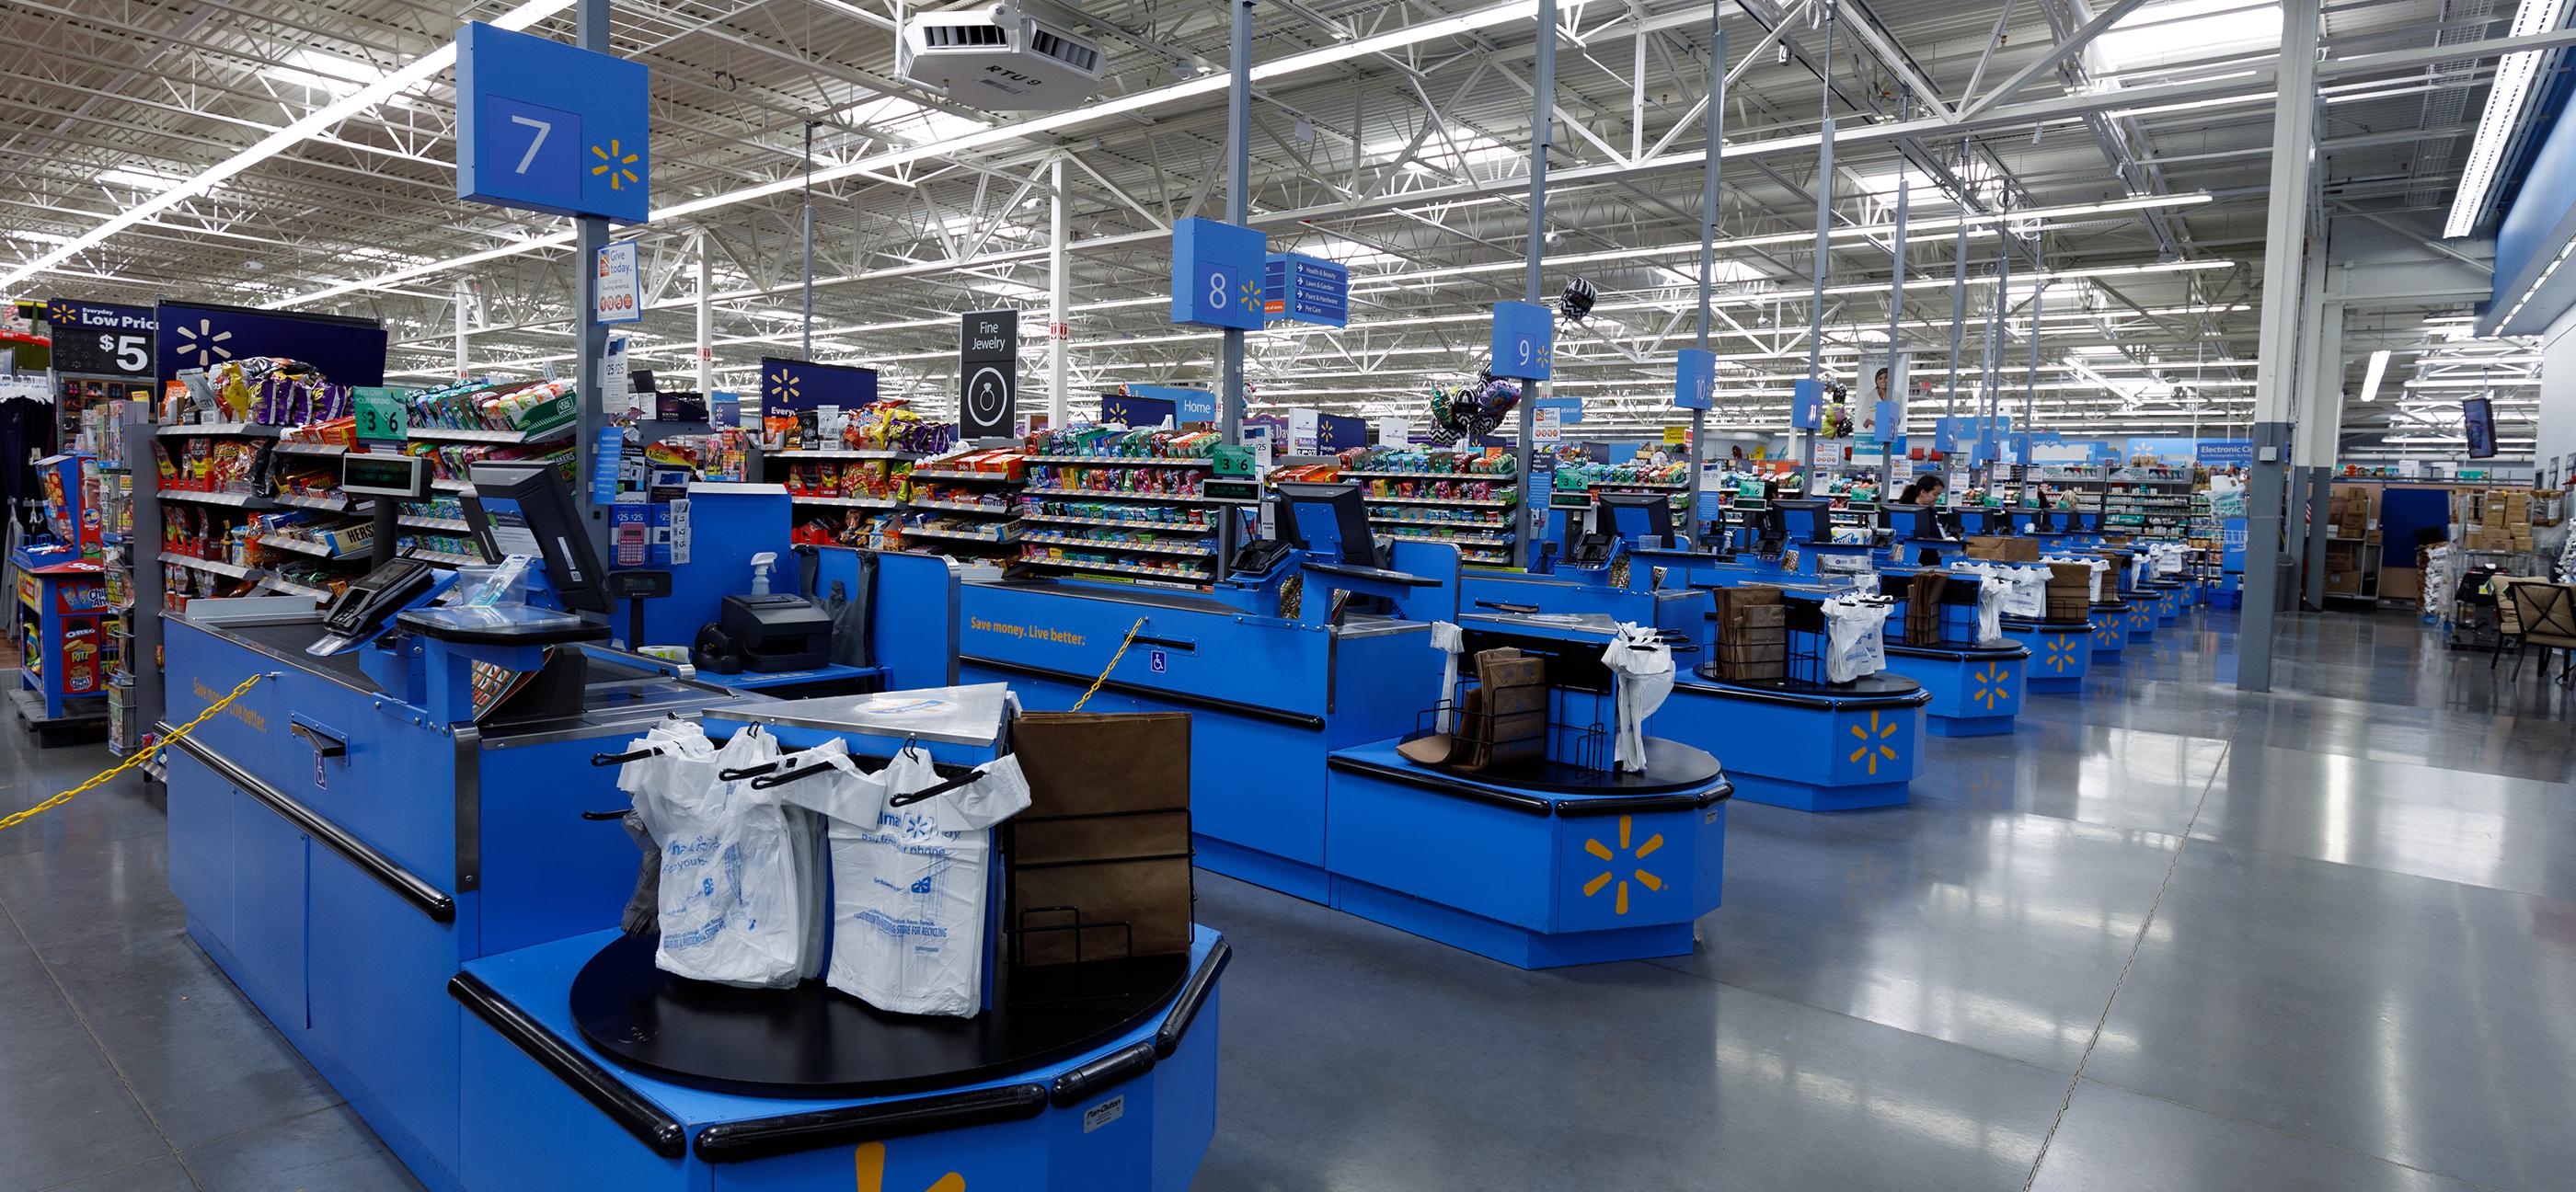 Walmart's Workforce of the Future - HBS Working Knowledge